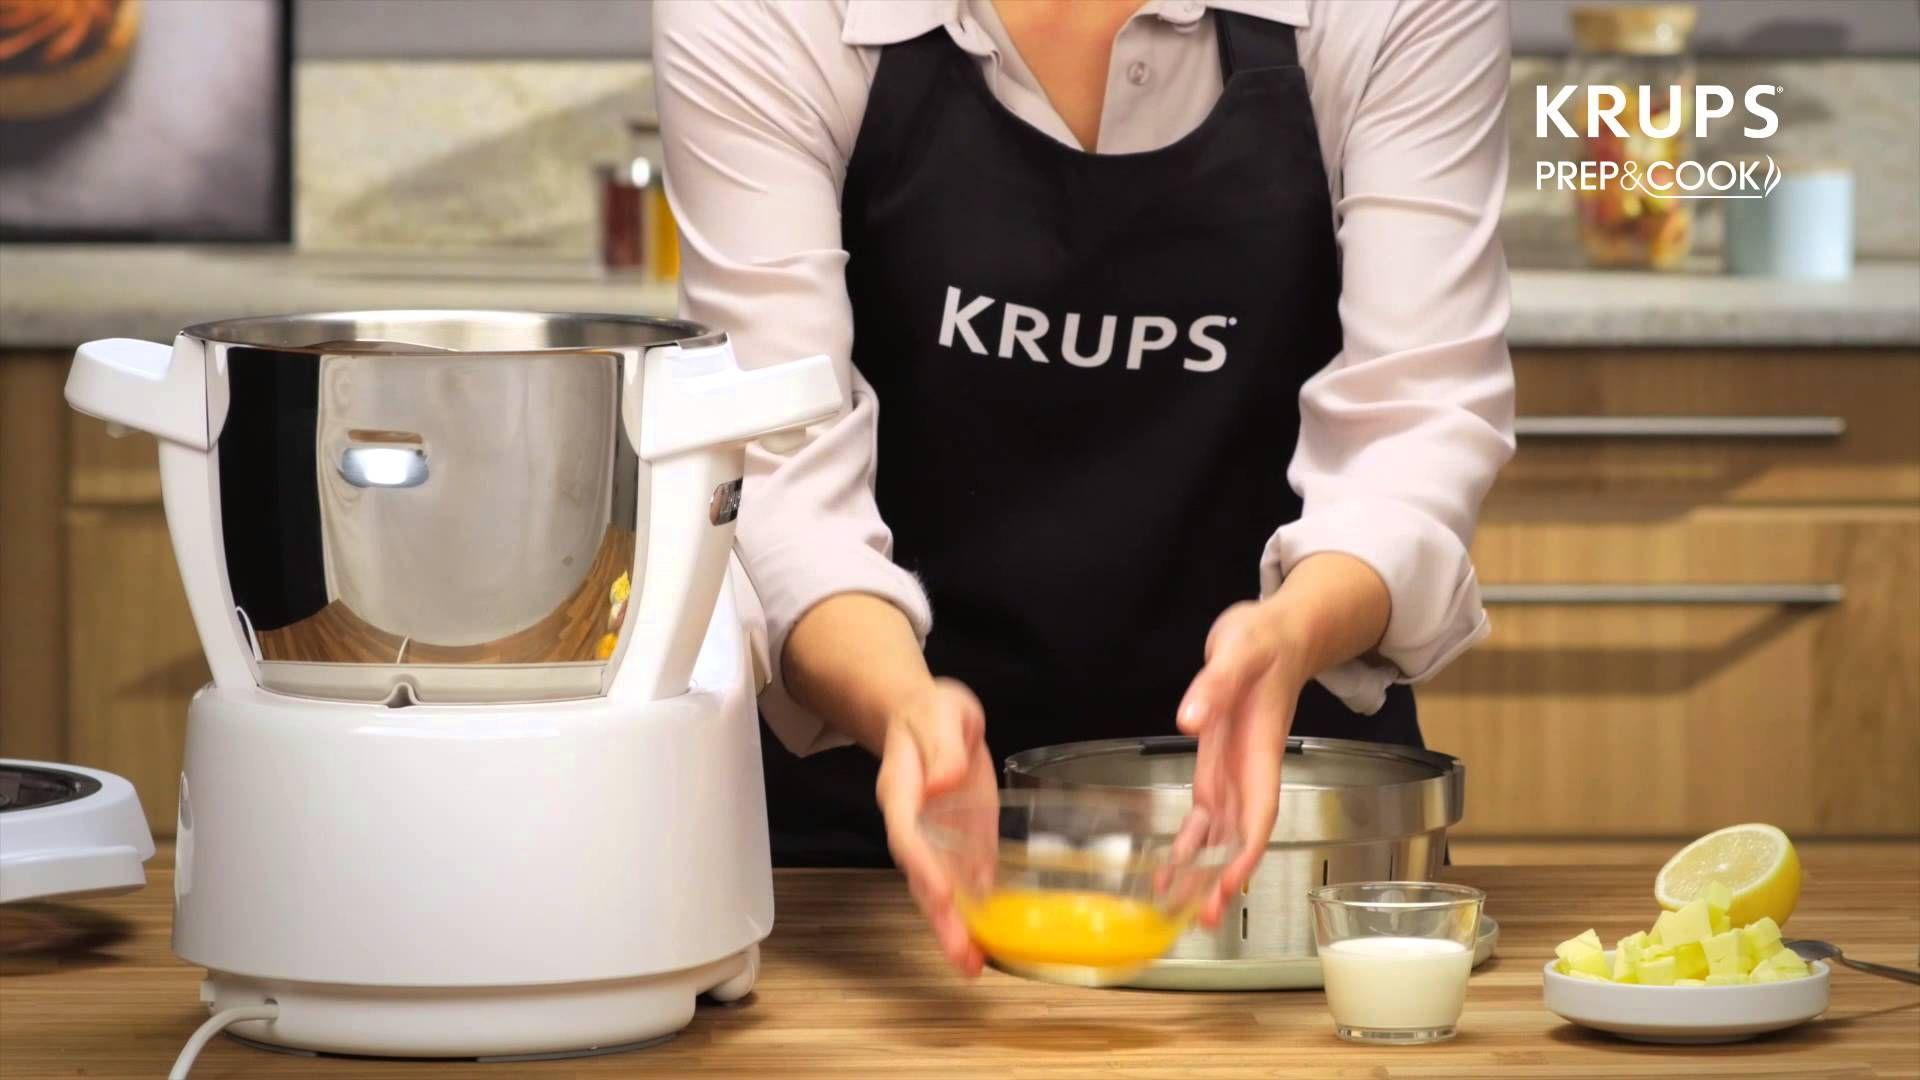 Hp 5031 Krups Prep Cook Rezept Gemuse Mit Sauce Hollandaise Krups Prep Cook Prep Cook Sauce Hollandaise